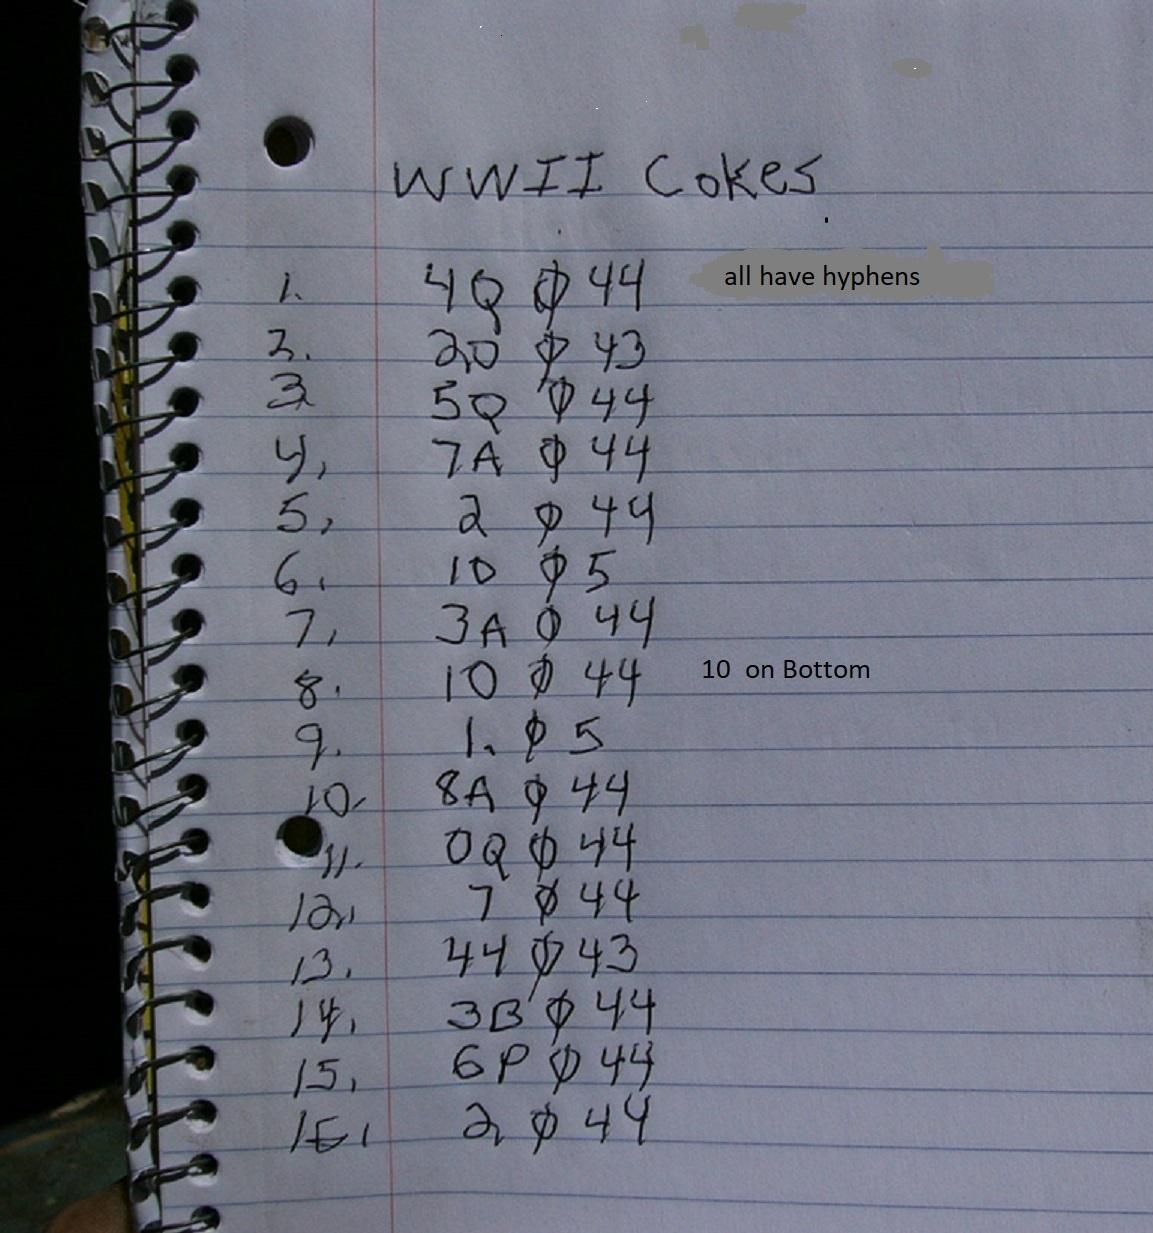 WW2Cokes3.JPG